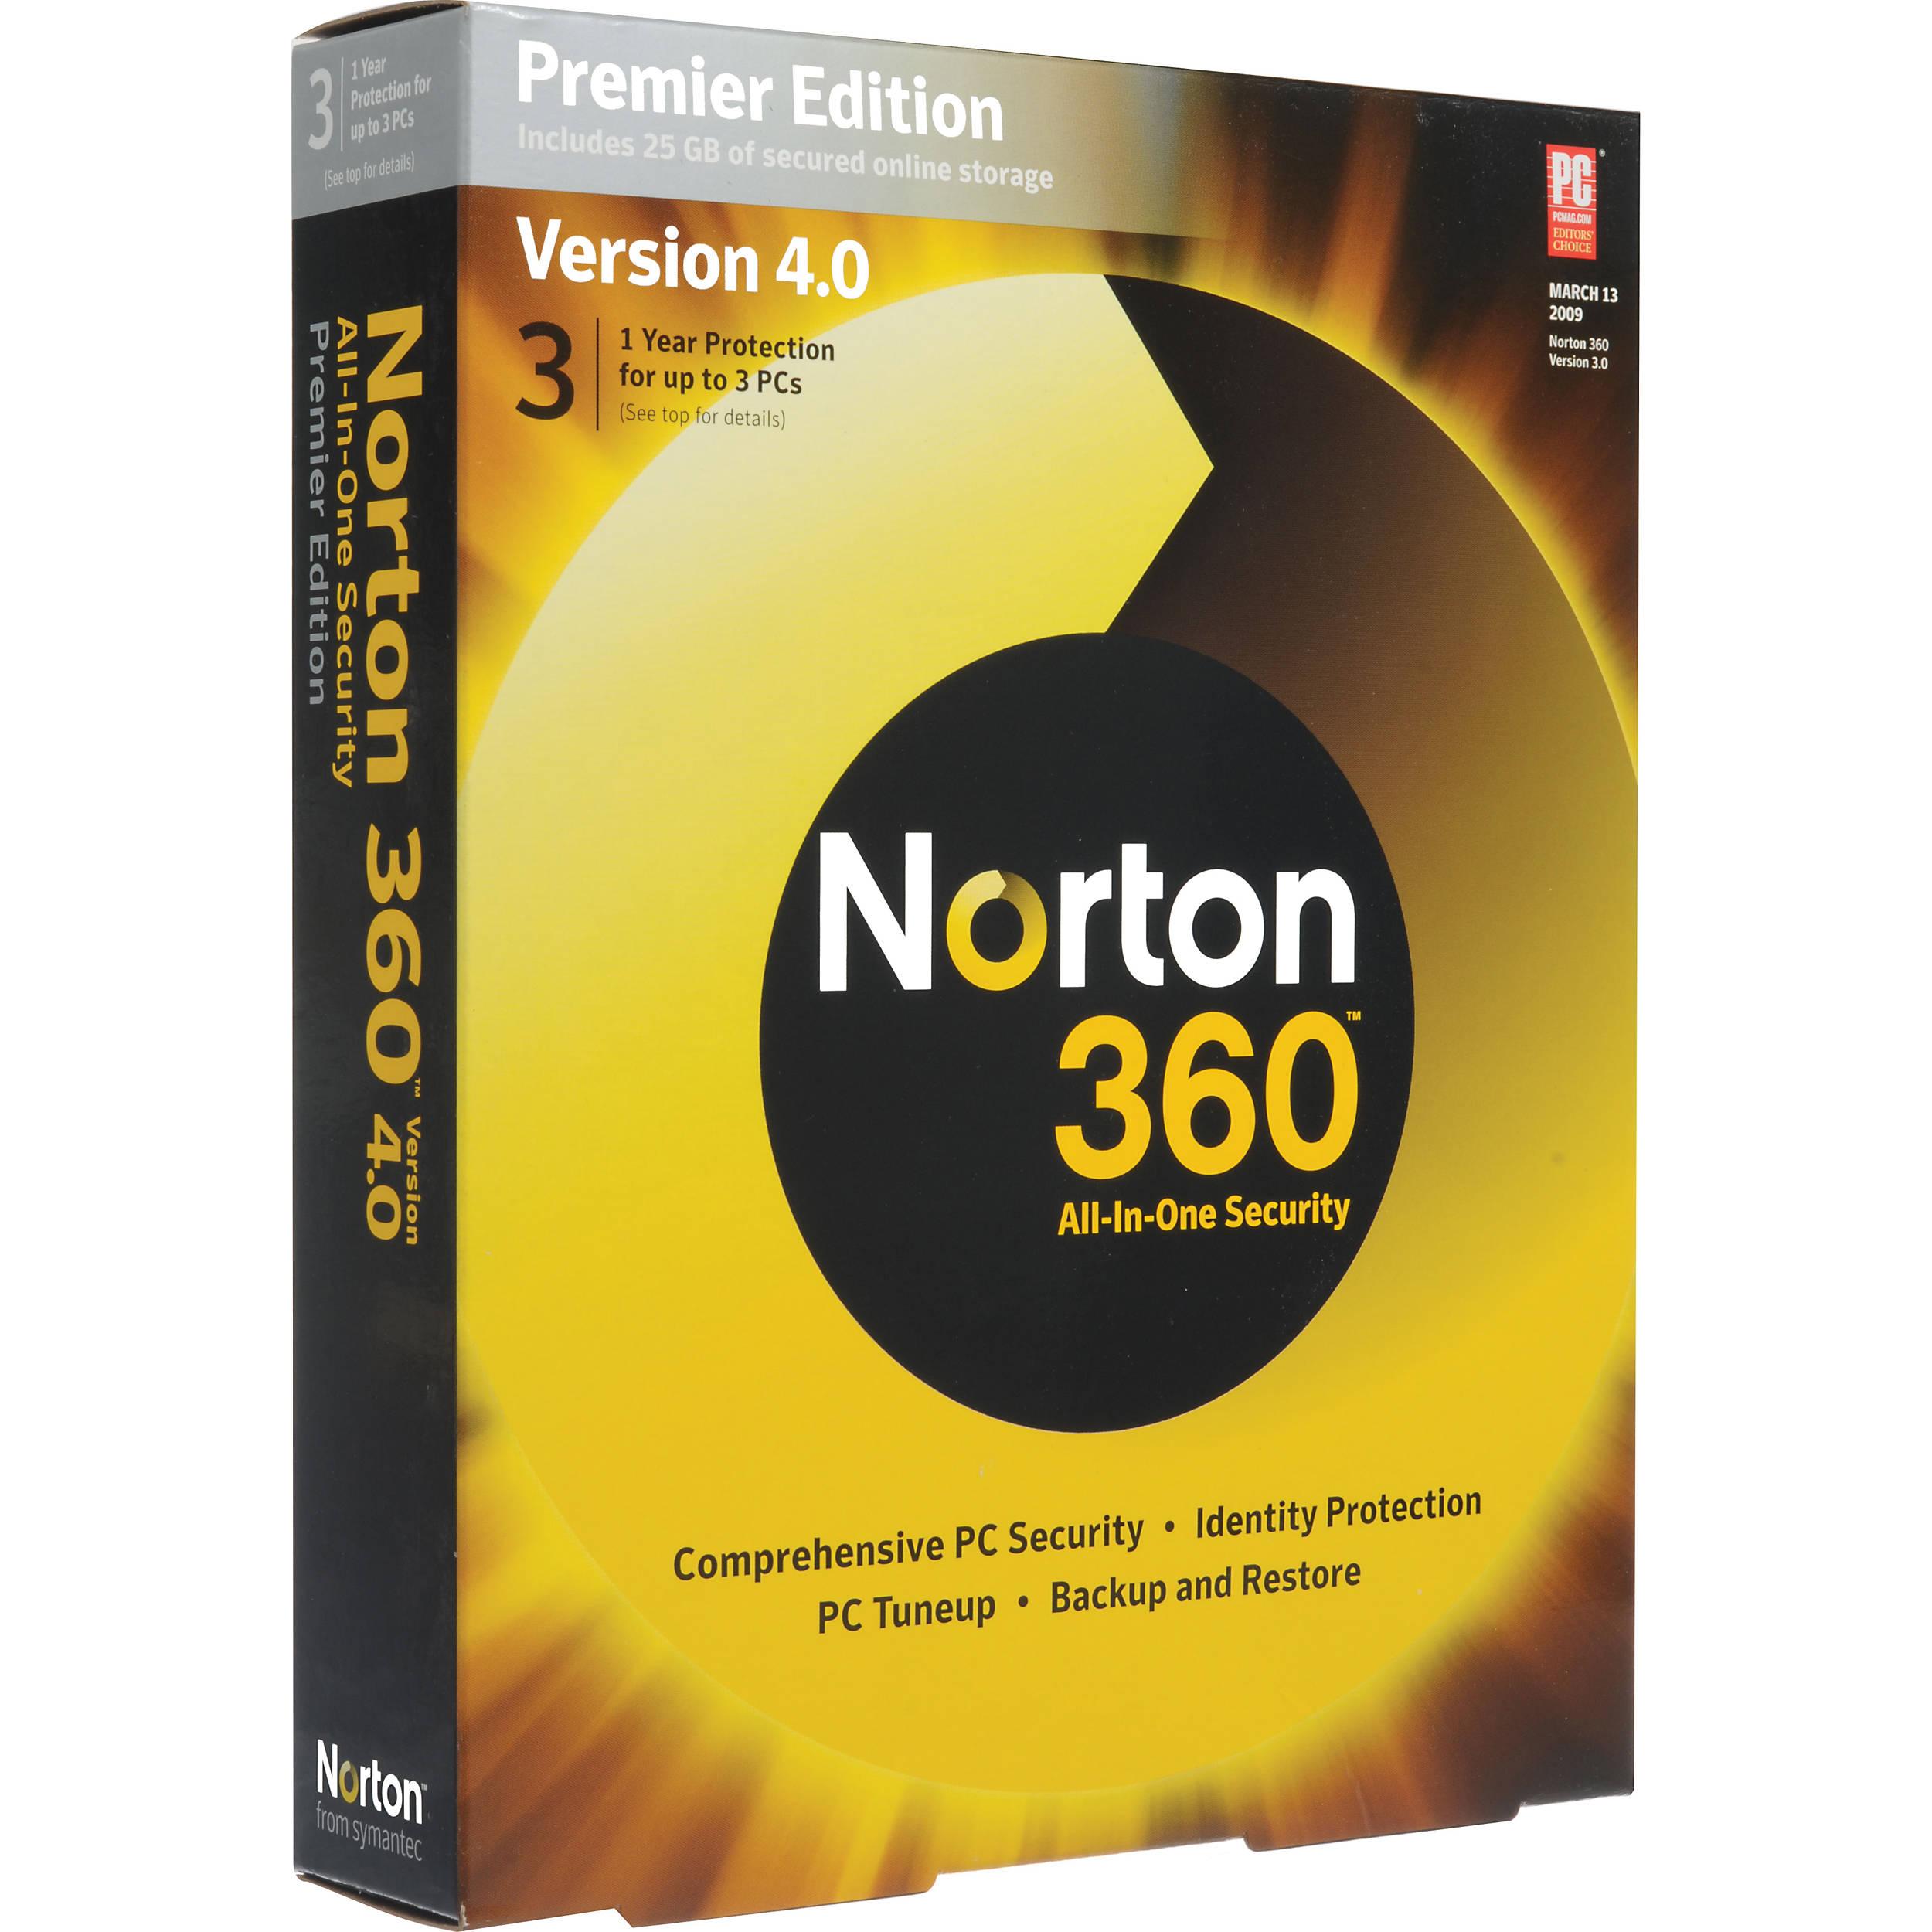 Introducing NEW Norton 360